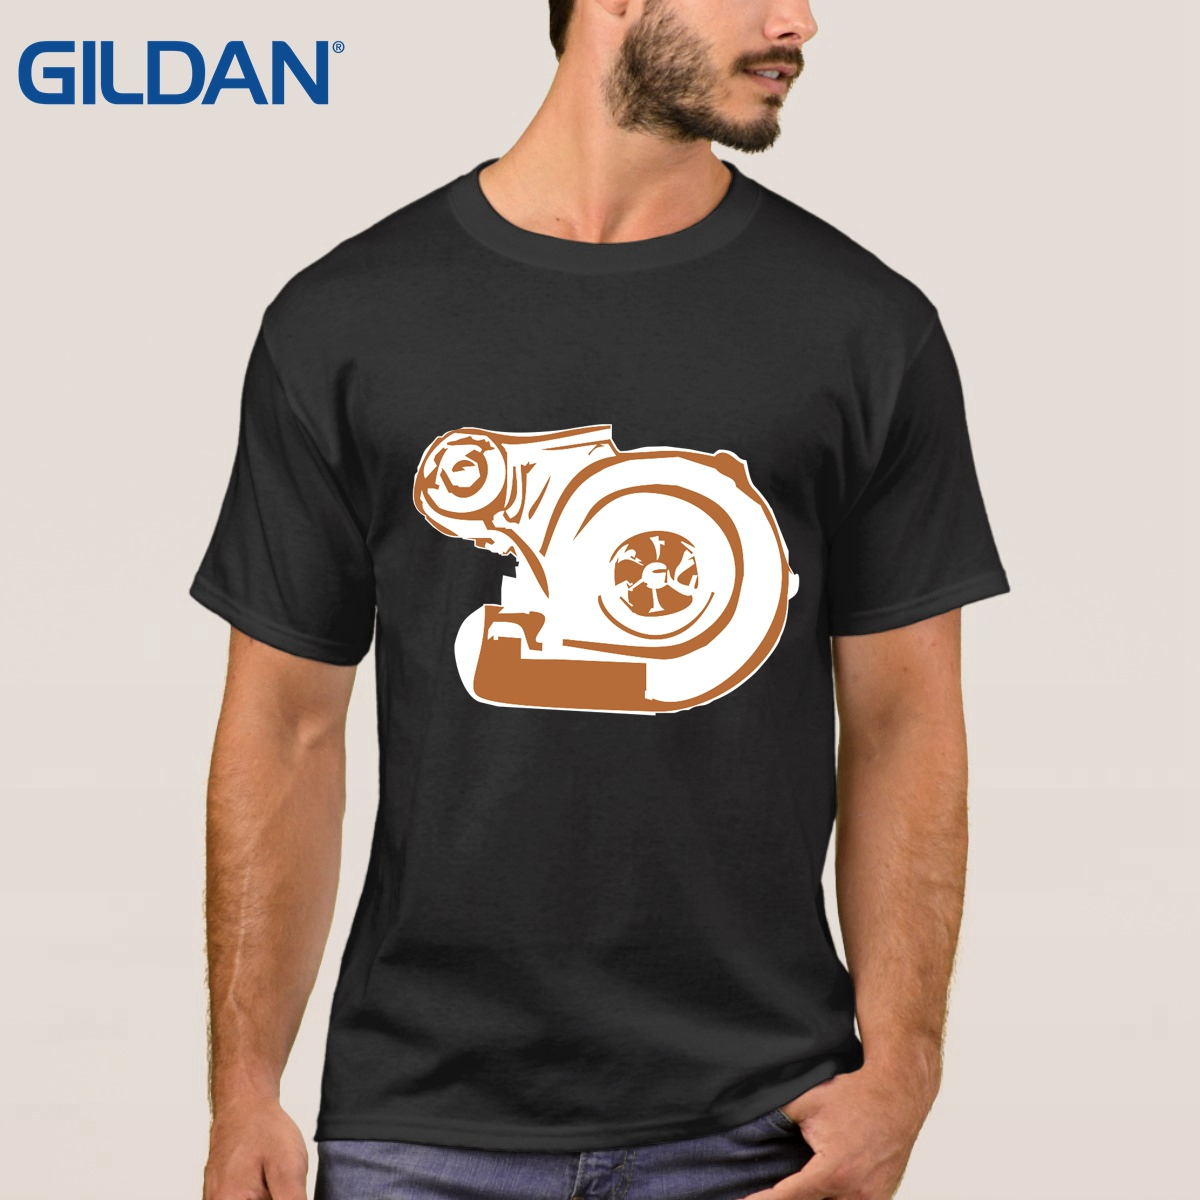 Black t shirt designs - Metal T Shirts Quality May The Force Turbo Racinger Rally Black Tee Shirt Men Plus Size